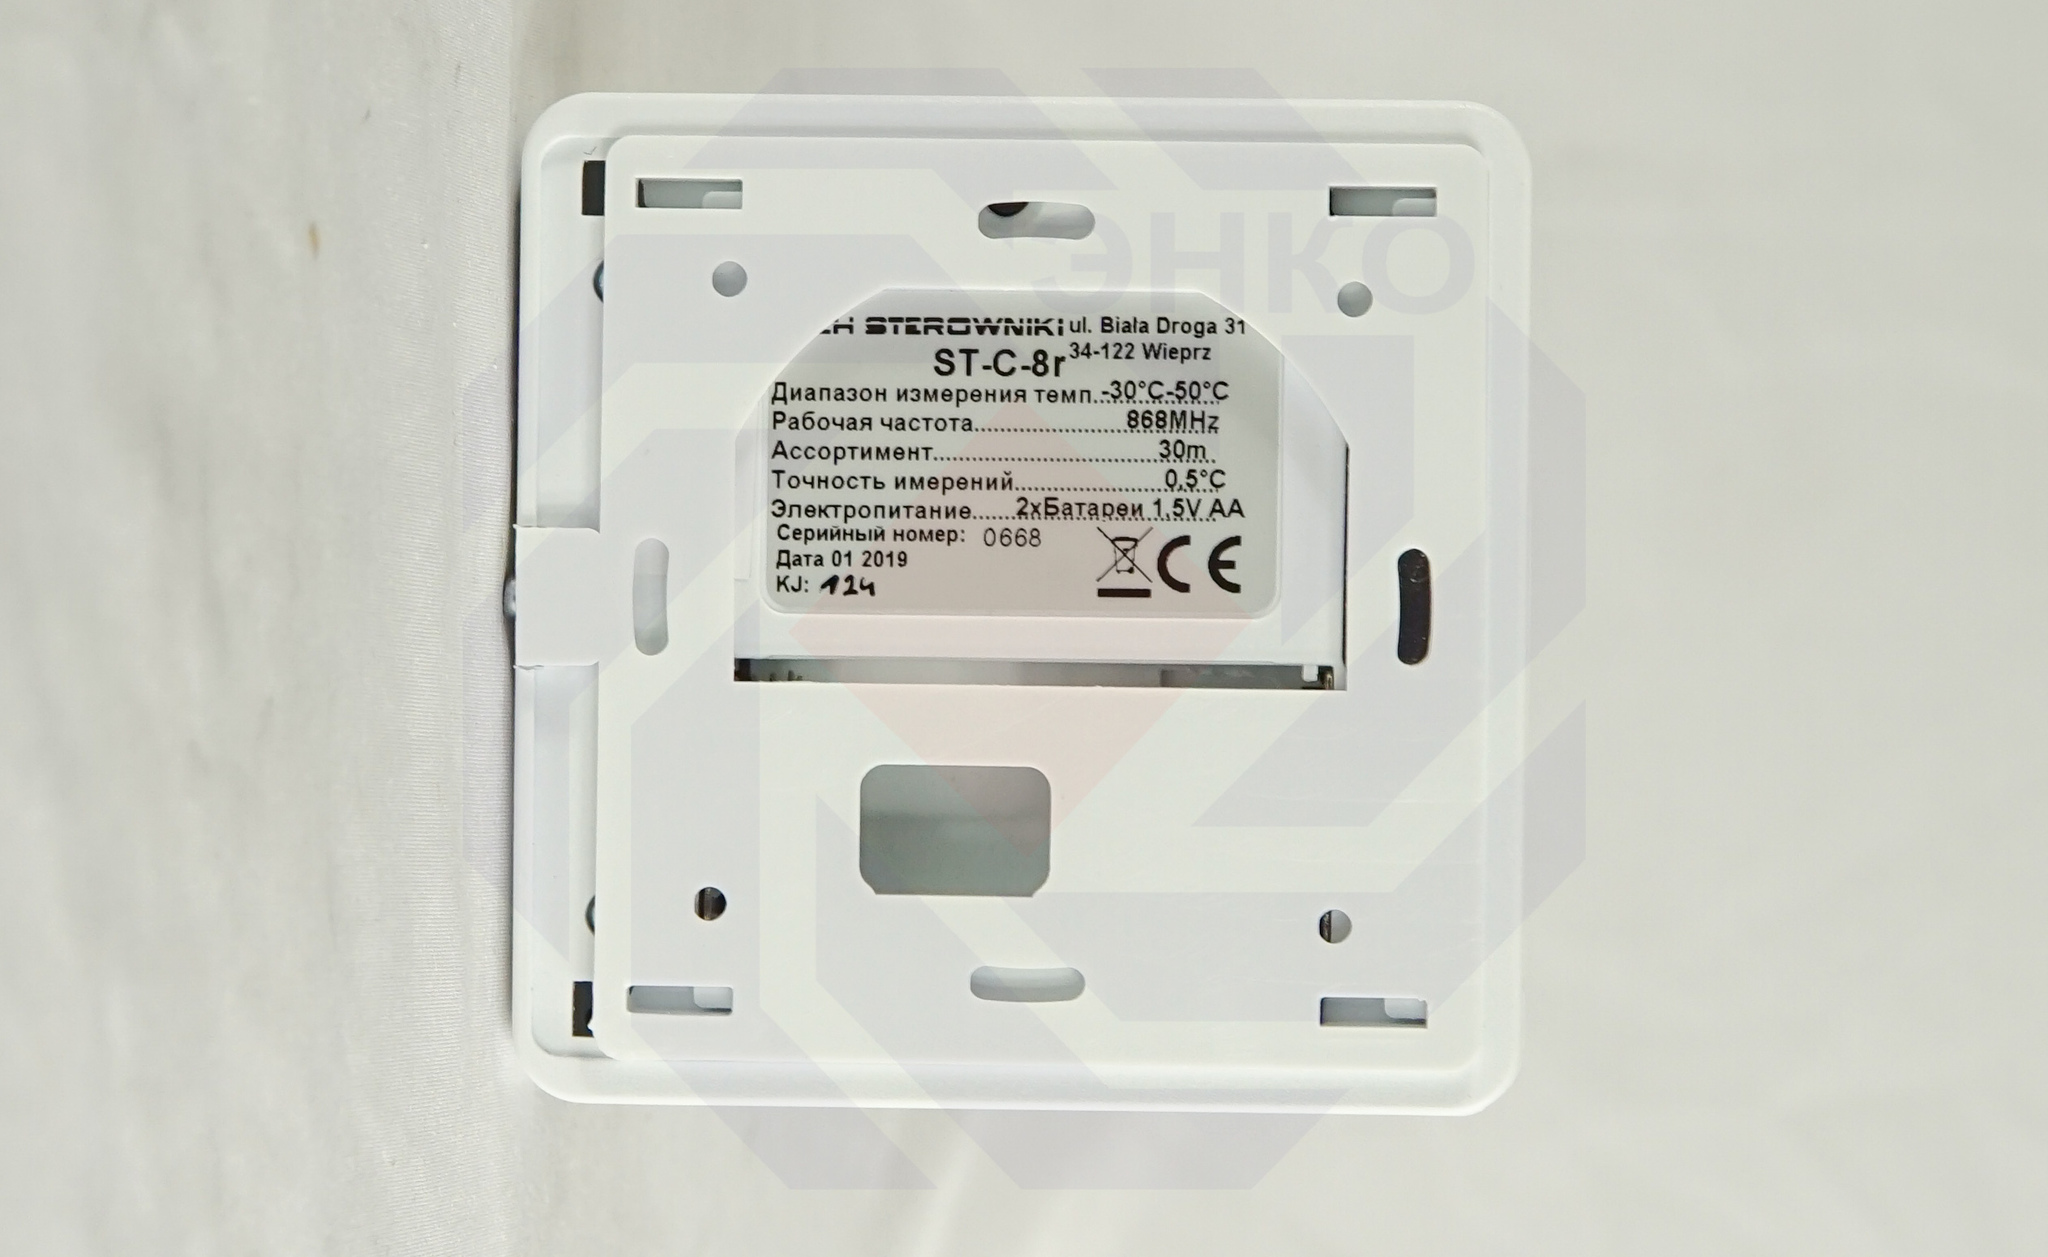 Датчик температуры комнатный TECH STEROWNIKI ST-C-8R белый